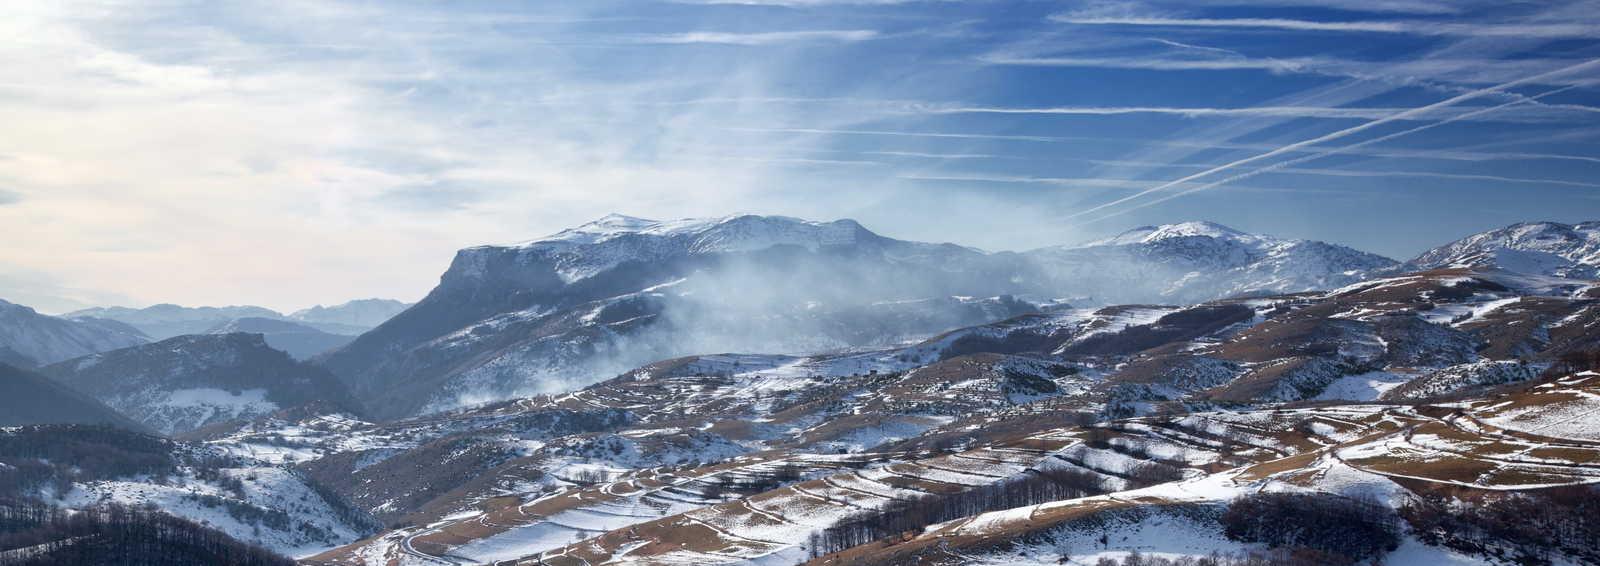 Bjelasnica, mountain near Sarajevo, Bosnia